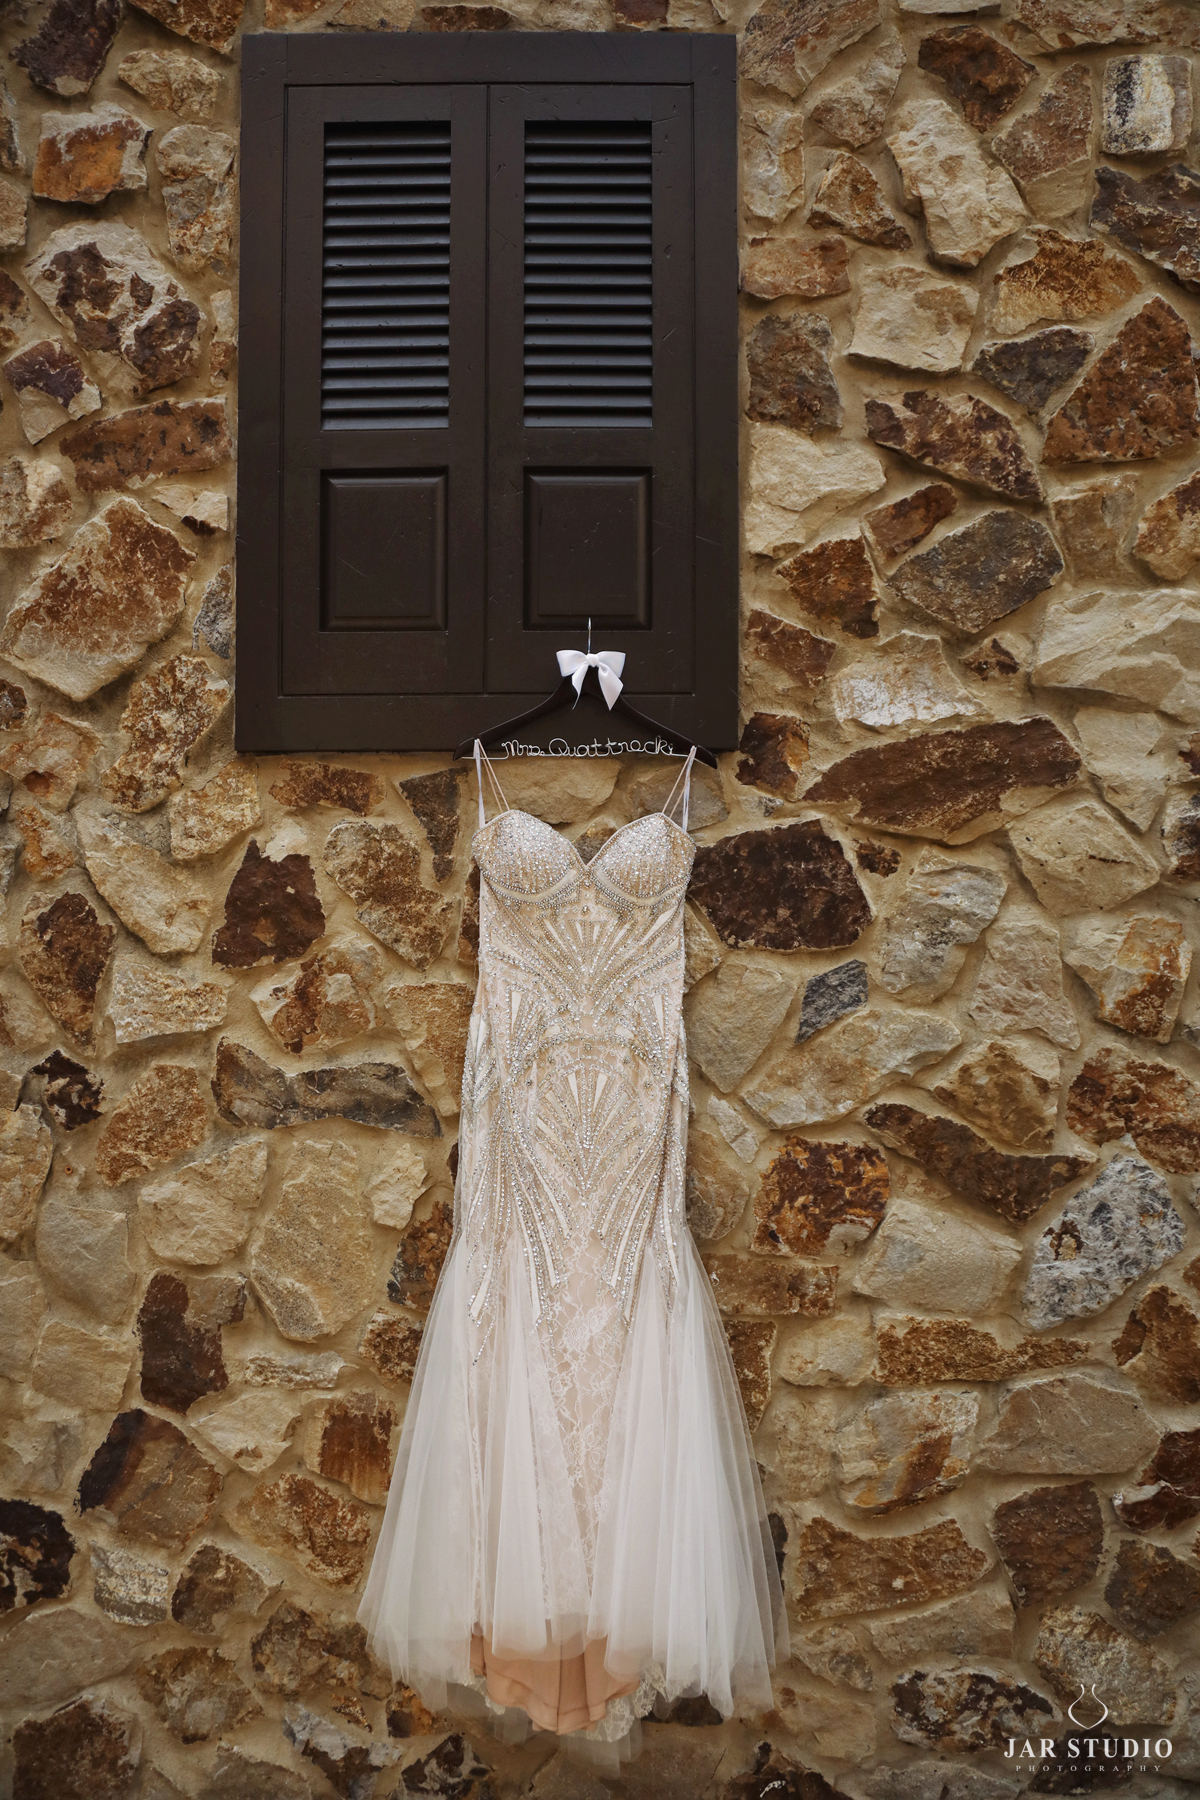 01-glamour-wedding-dress-jarstudio.jpg